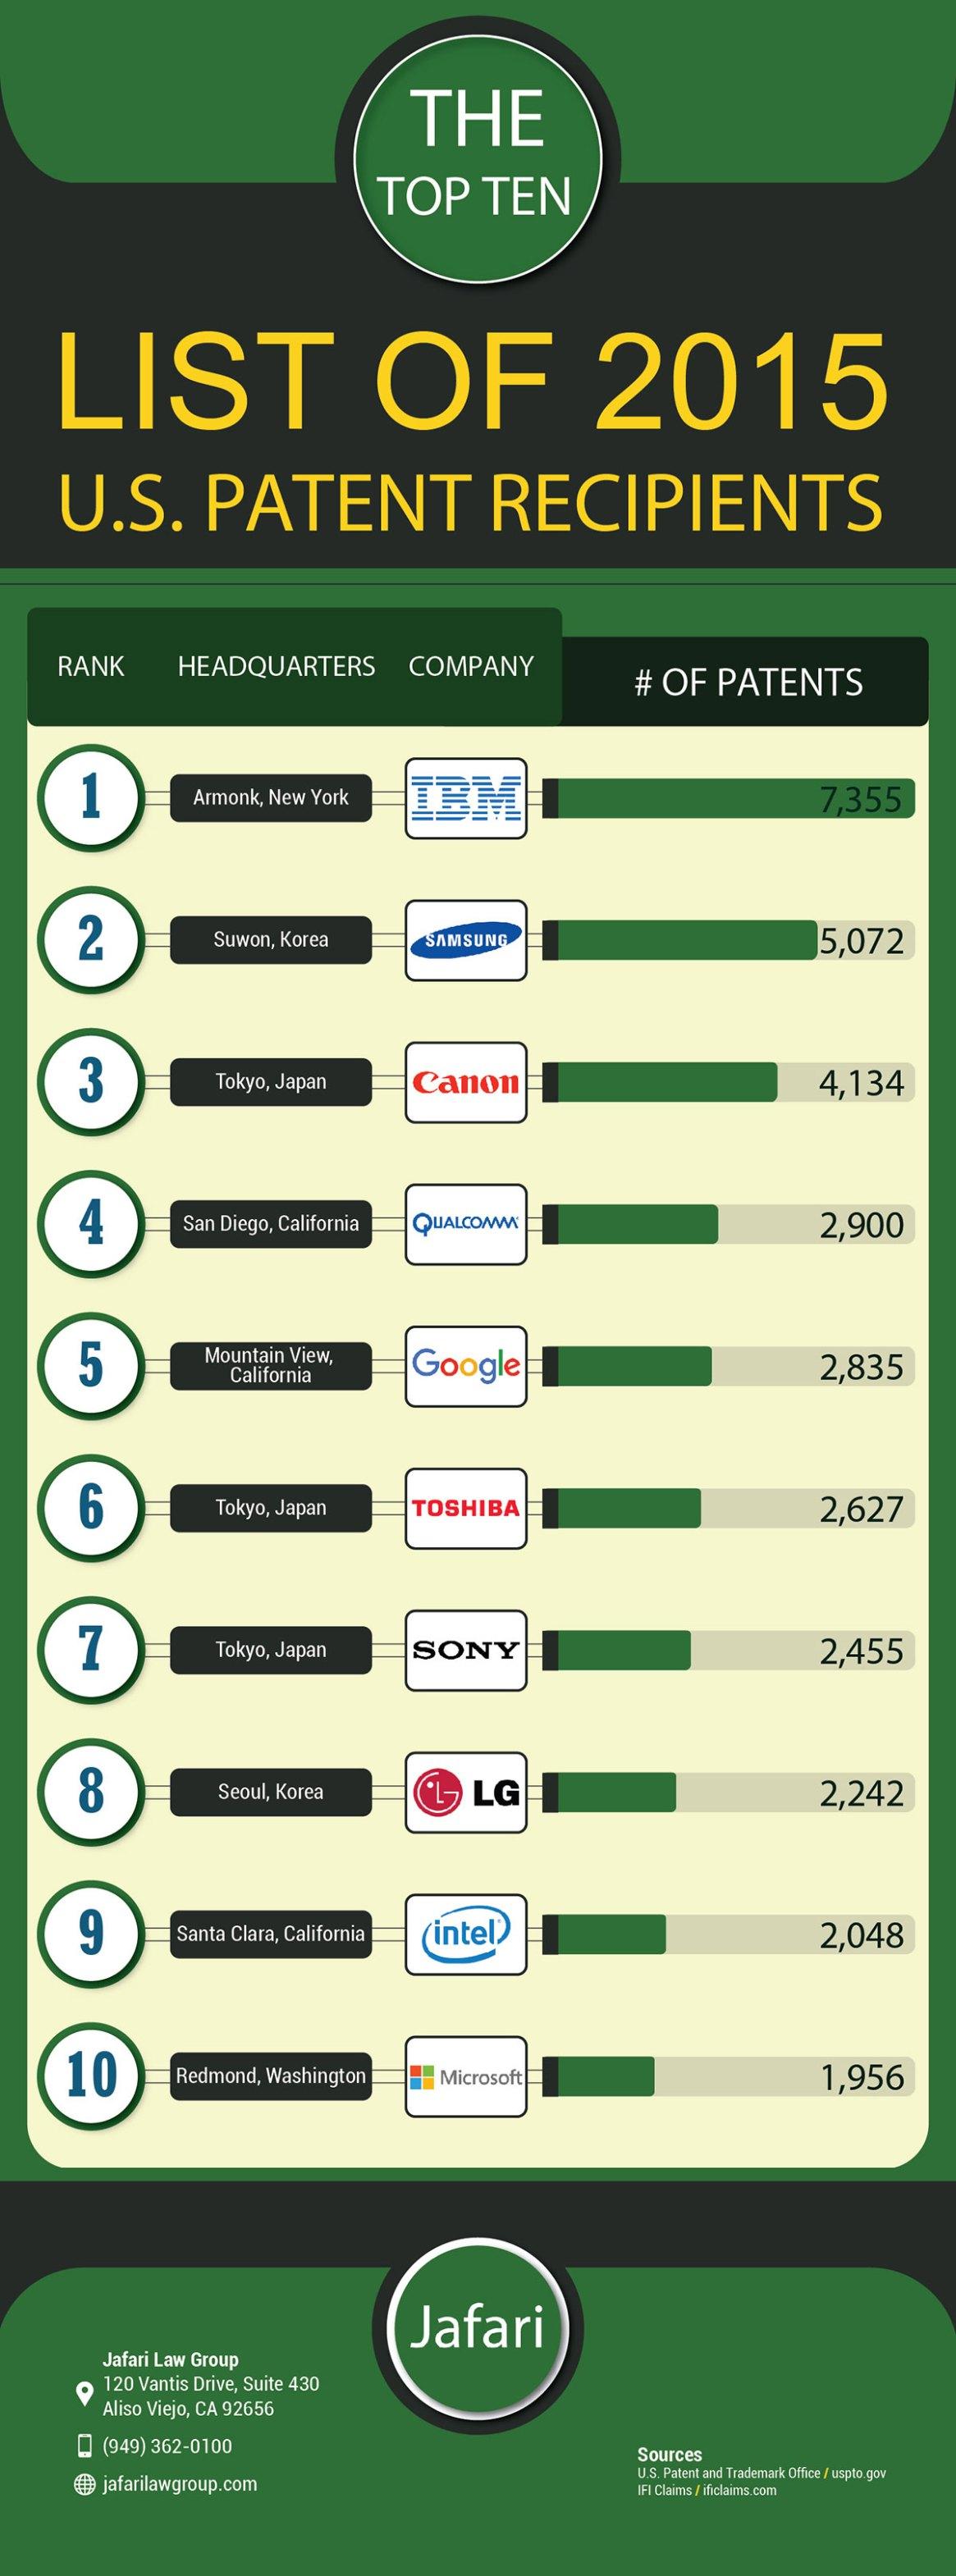 Top 10 List of 2015 U.S. Patent Recipients